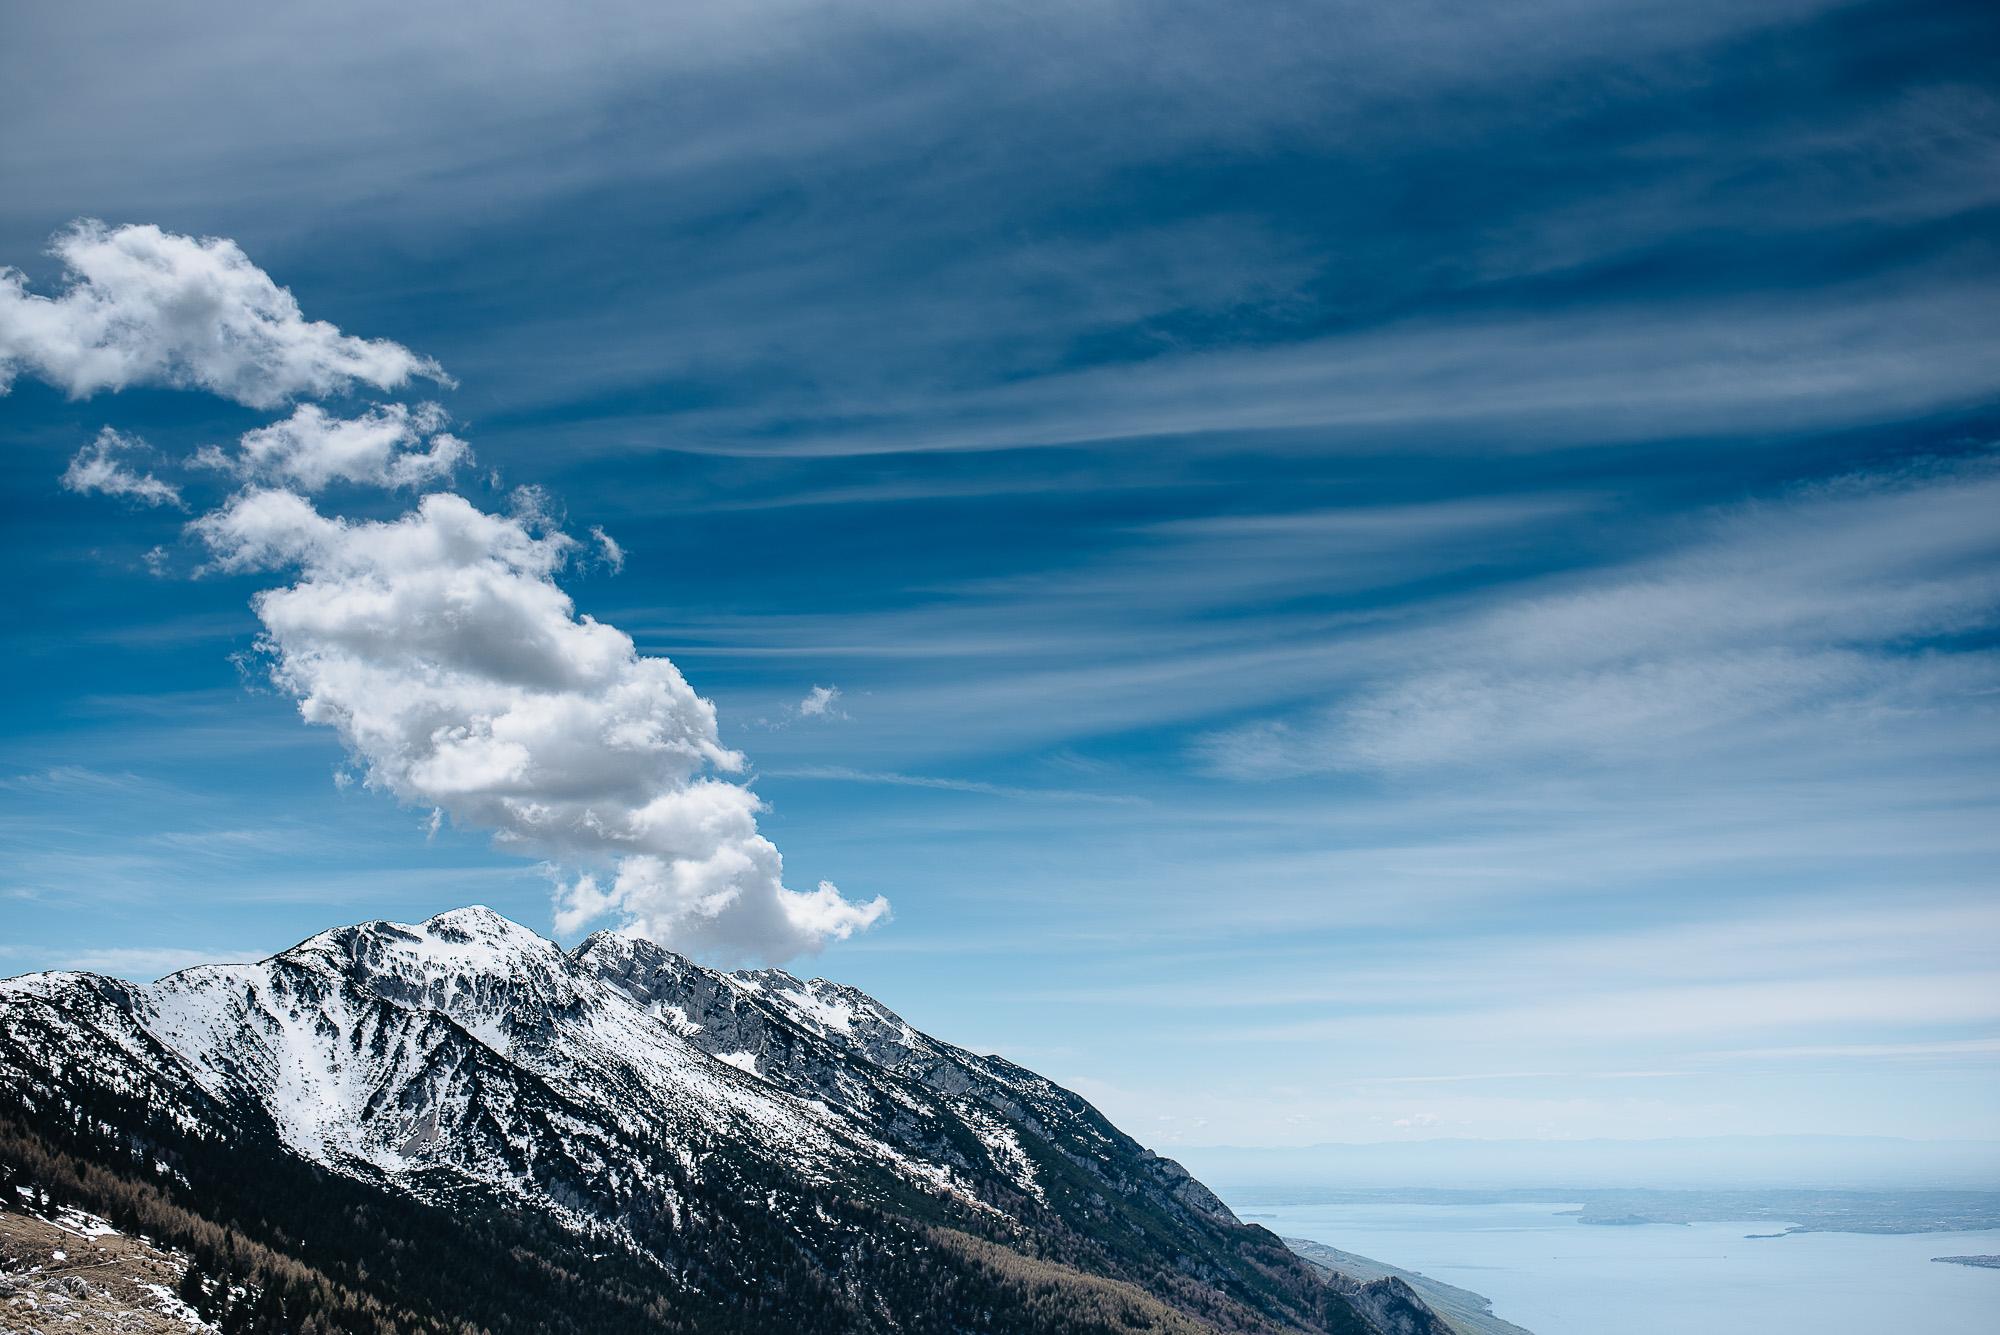 OurBeautifulAdventure-LakeGarda-Italy-Blog-1173.jpg